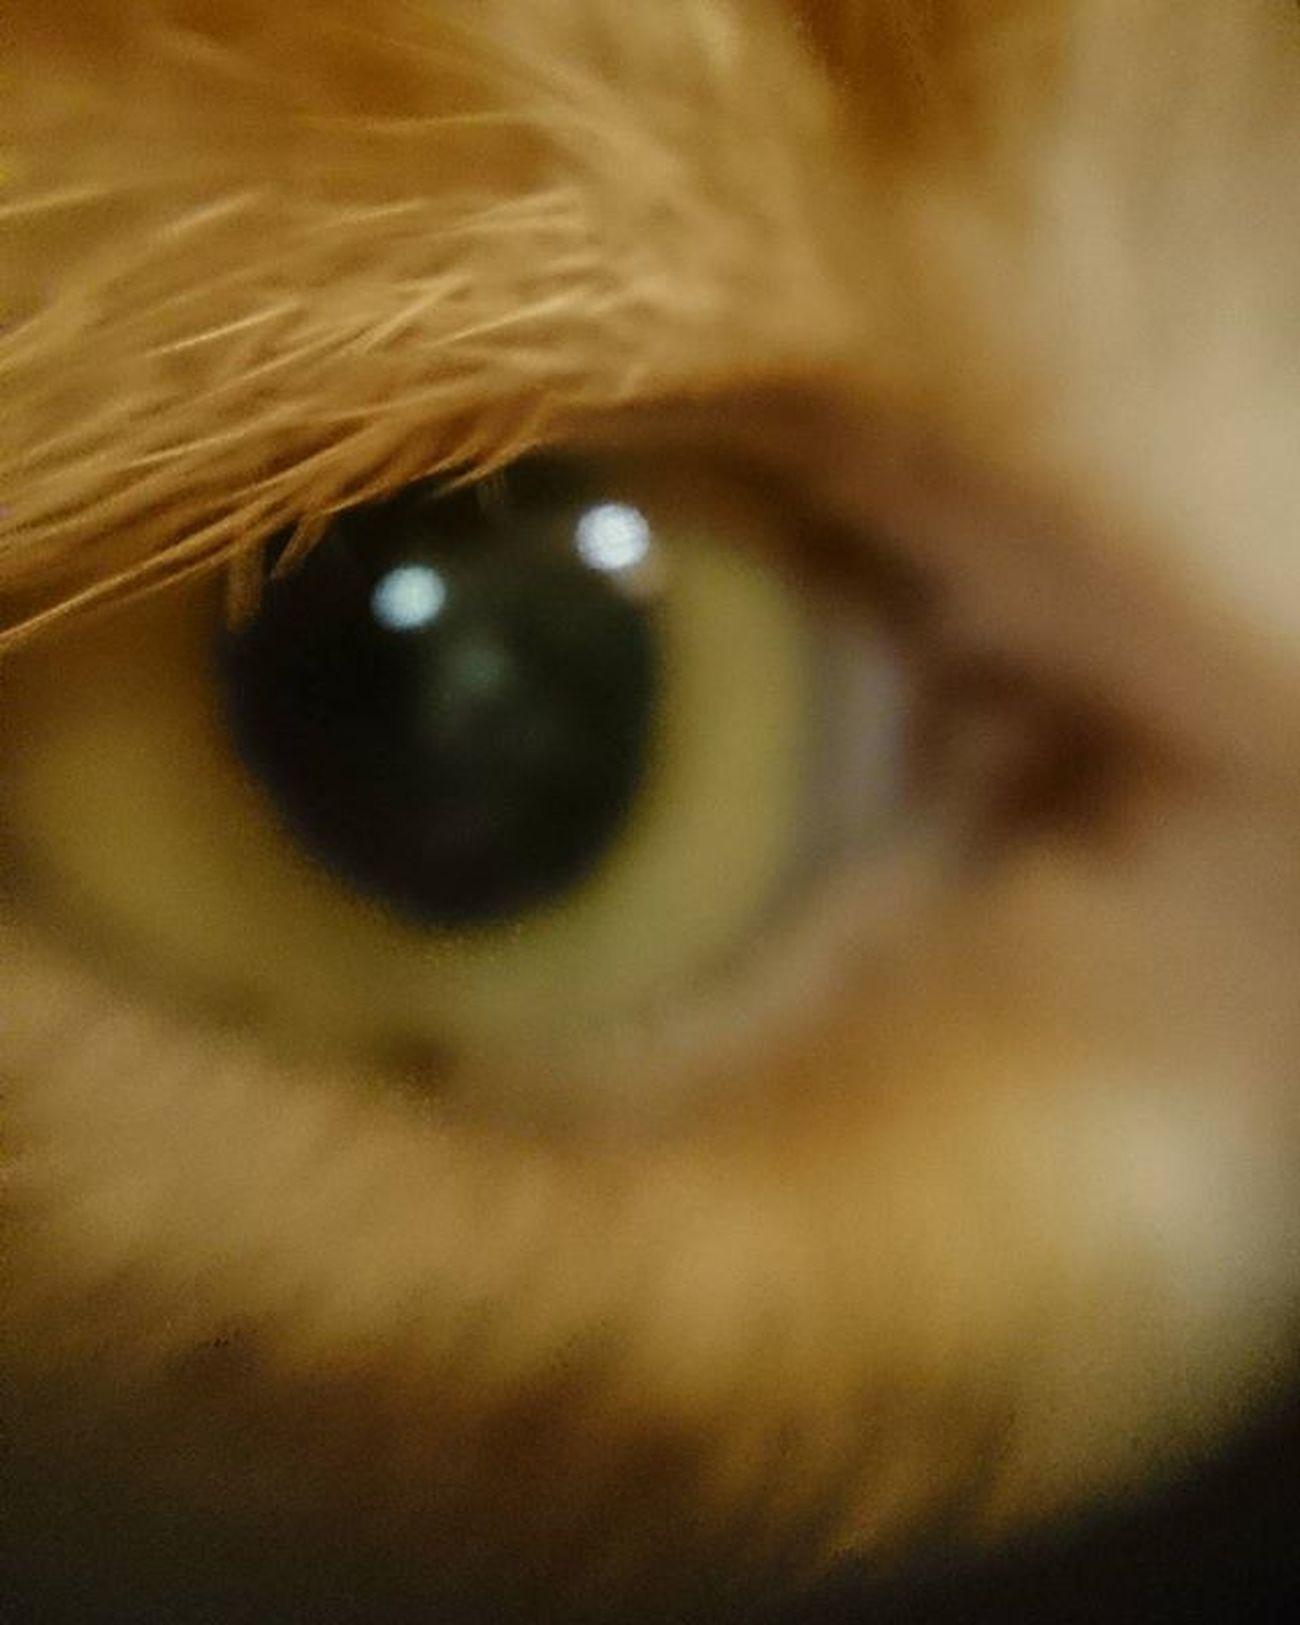 Catwatch Iamwatchingyou Hello Pepetheredcat Catphoto Catmoment Catlife Justicat Catsofinstagram Worlddofcats